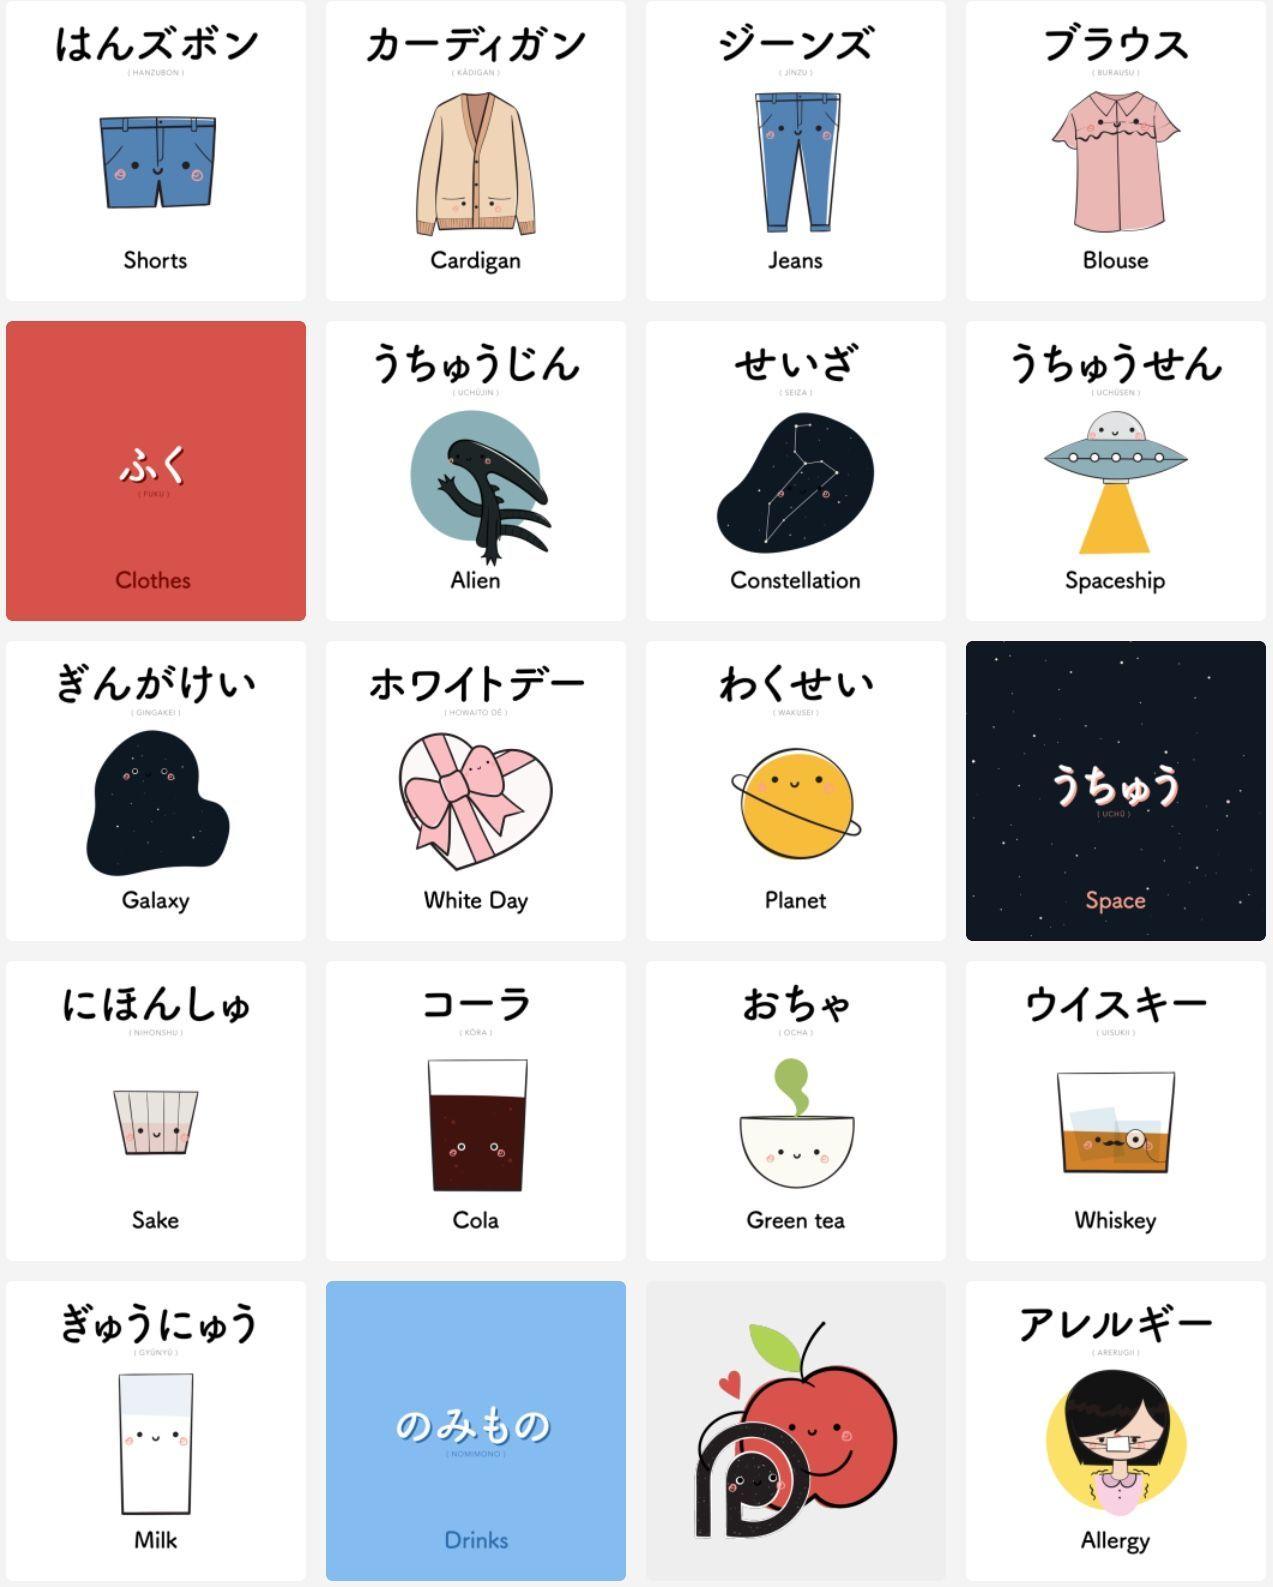 Pin by Shelley Sorek on Japanese flash cards Basic